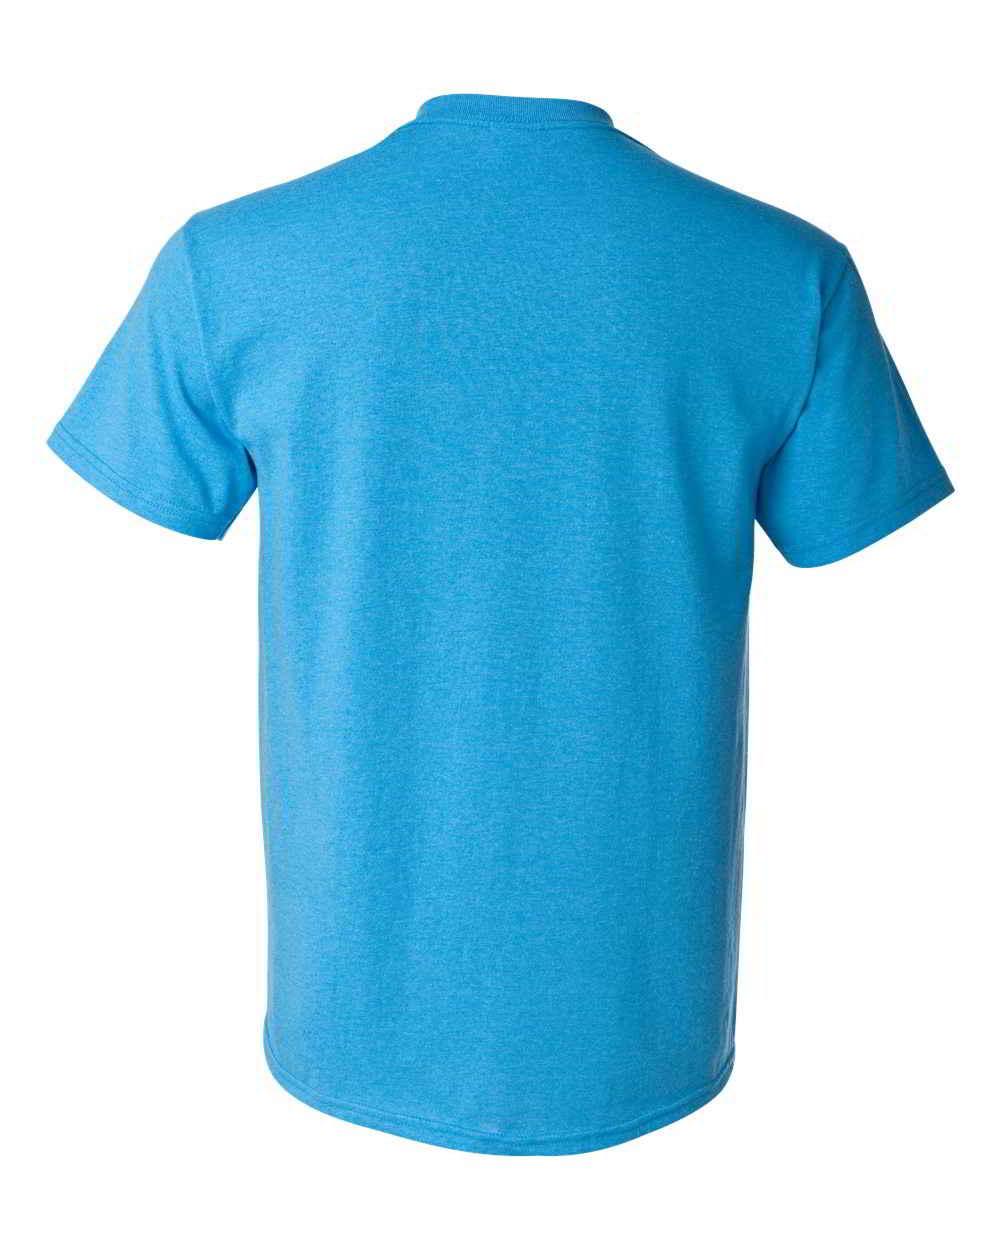 Gildan-Heavy-Cotton-Short-Sleeve-Mens-Blue-T-Shirts-5000 thumbnail 13